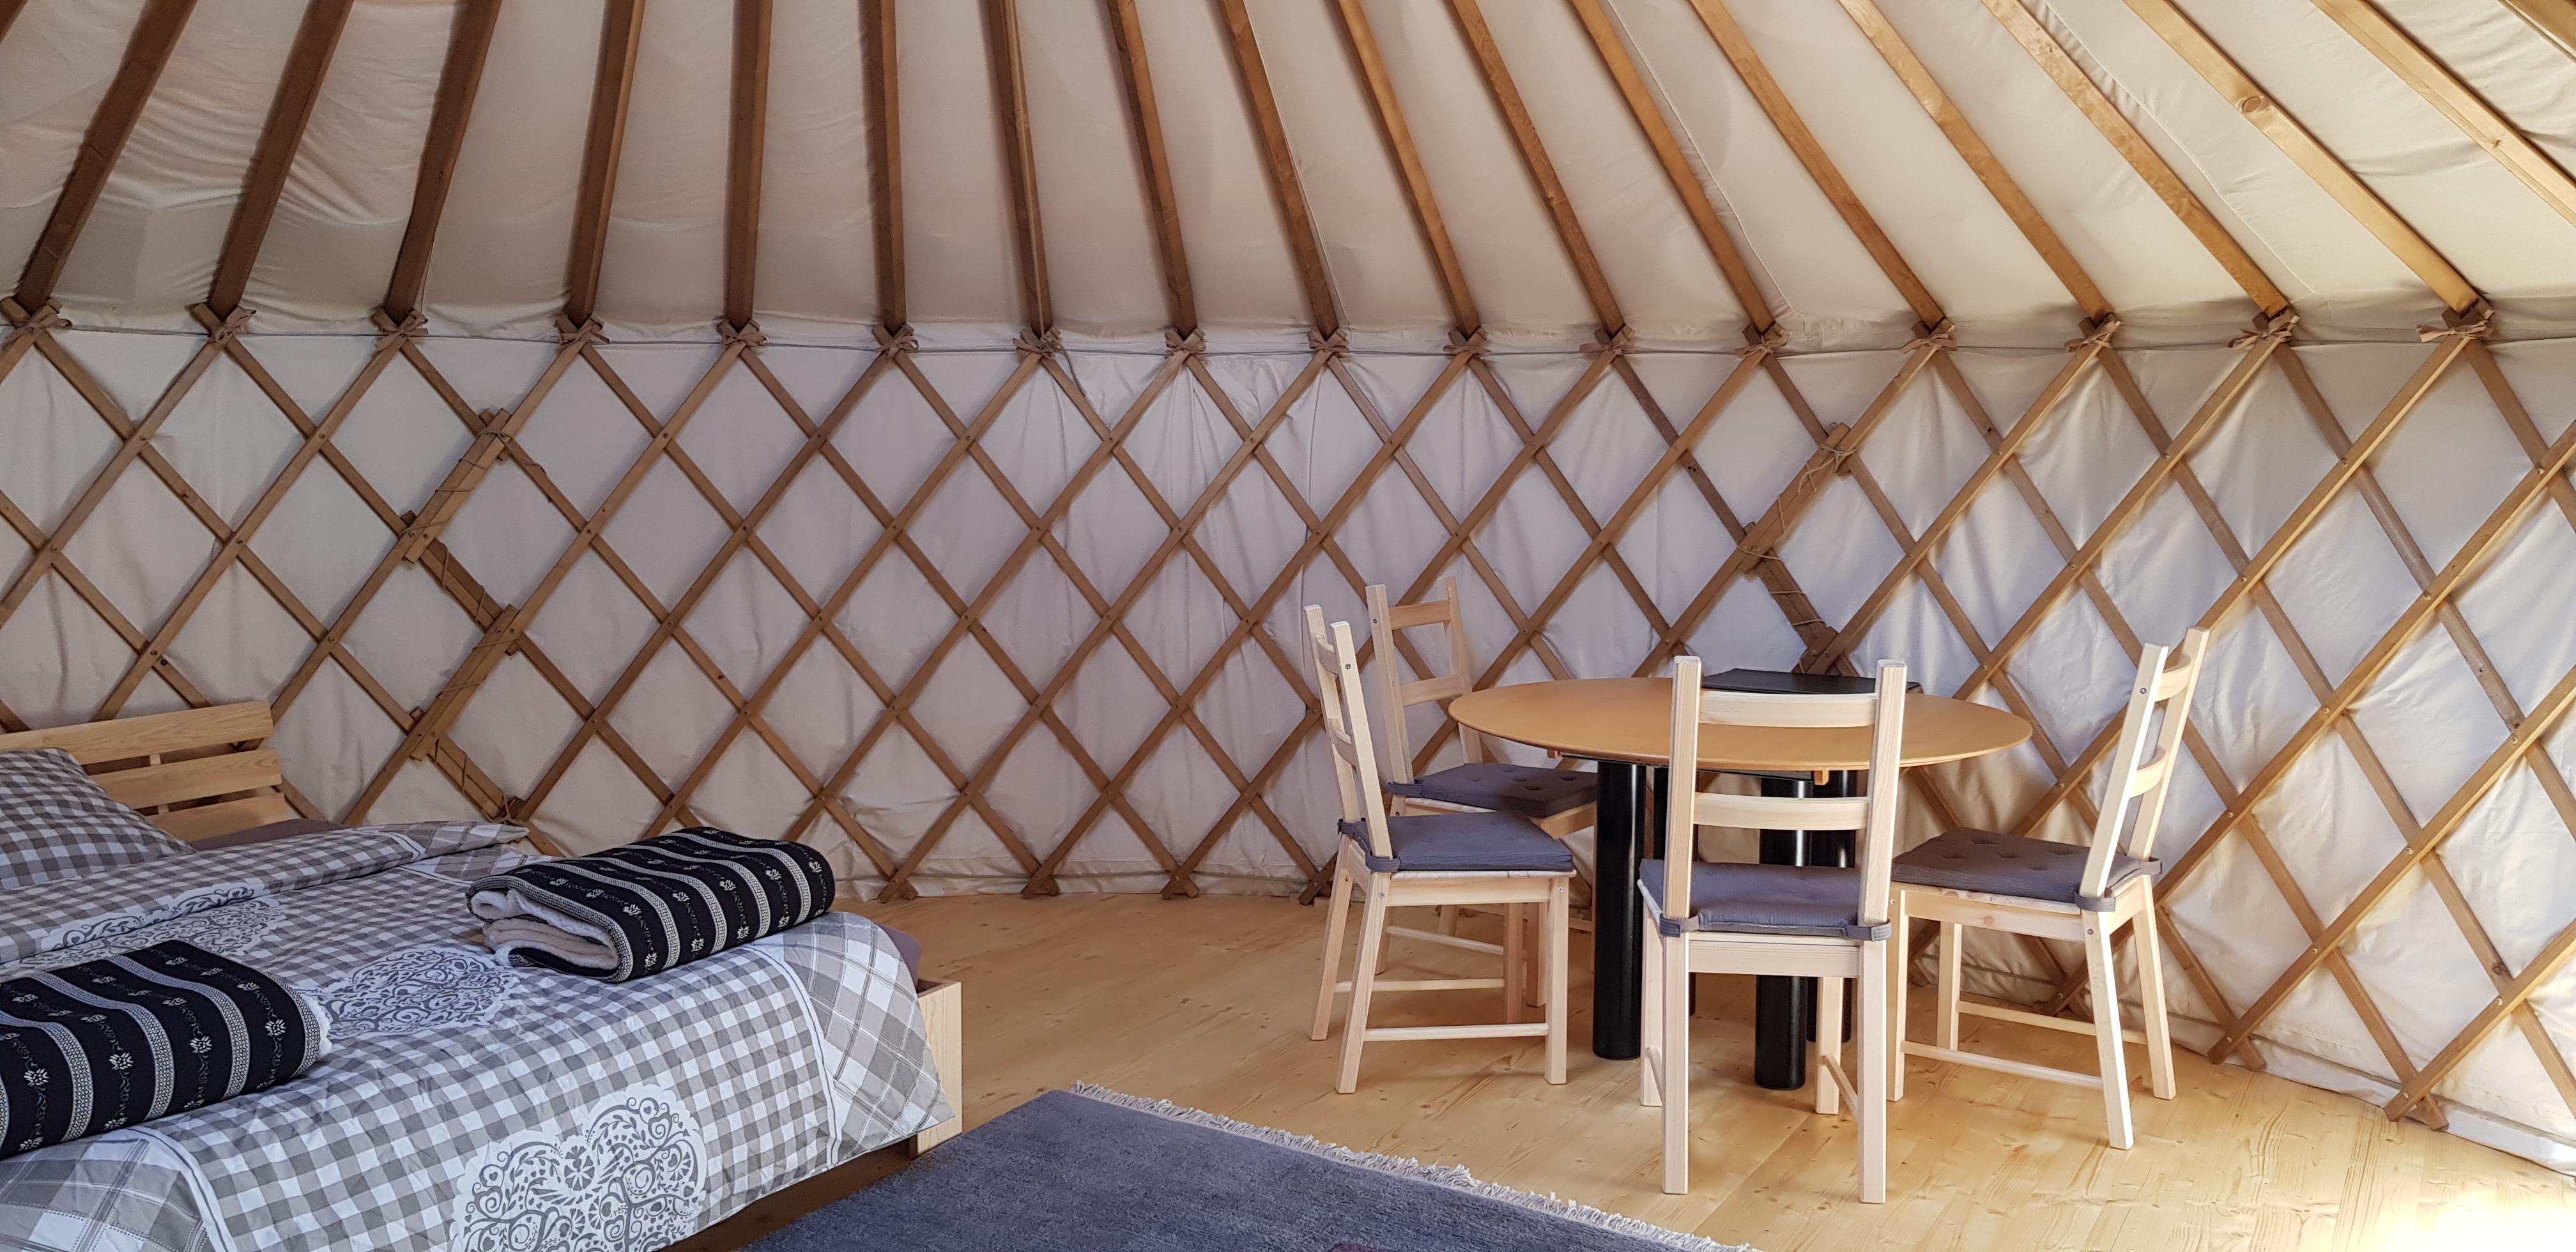 eine jurte im vergessenen tal 123 zeltwelt. Black Bedroom Furniture Sets. Home Design Ideas